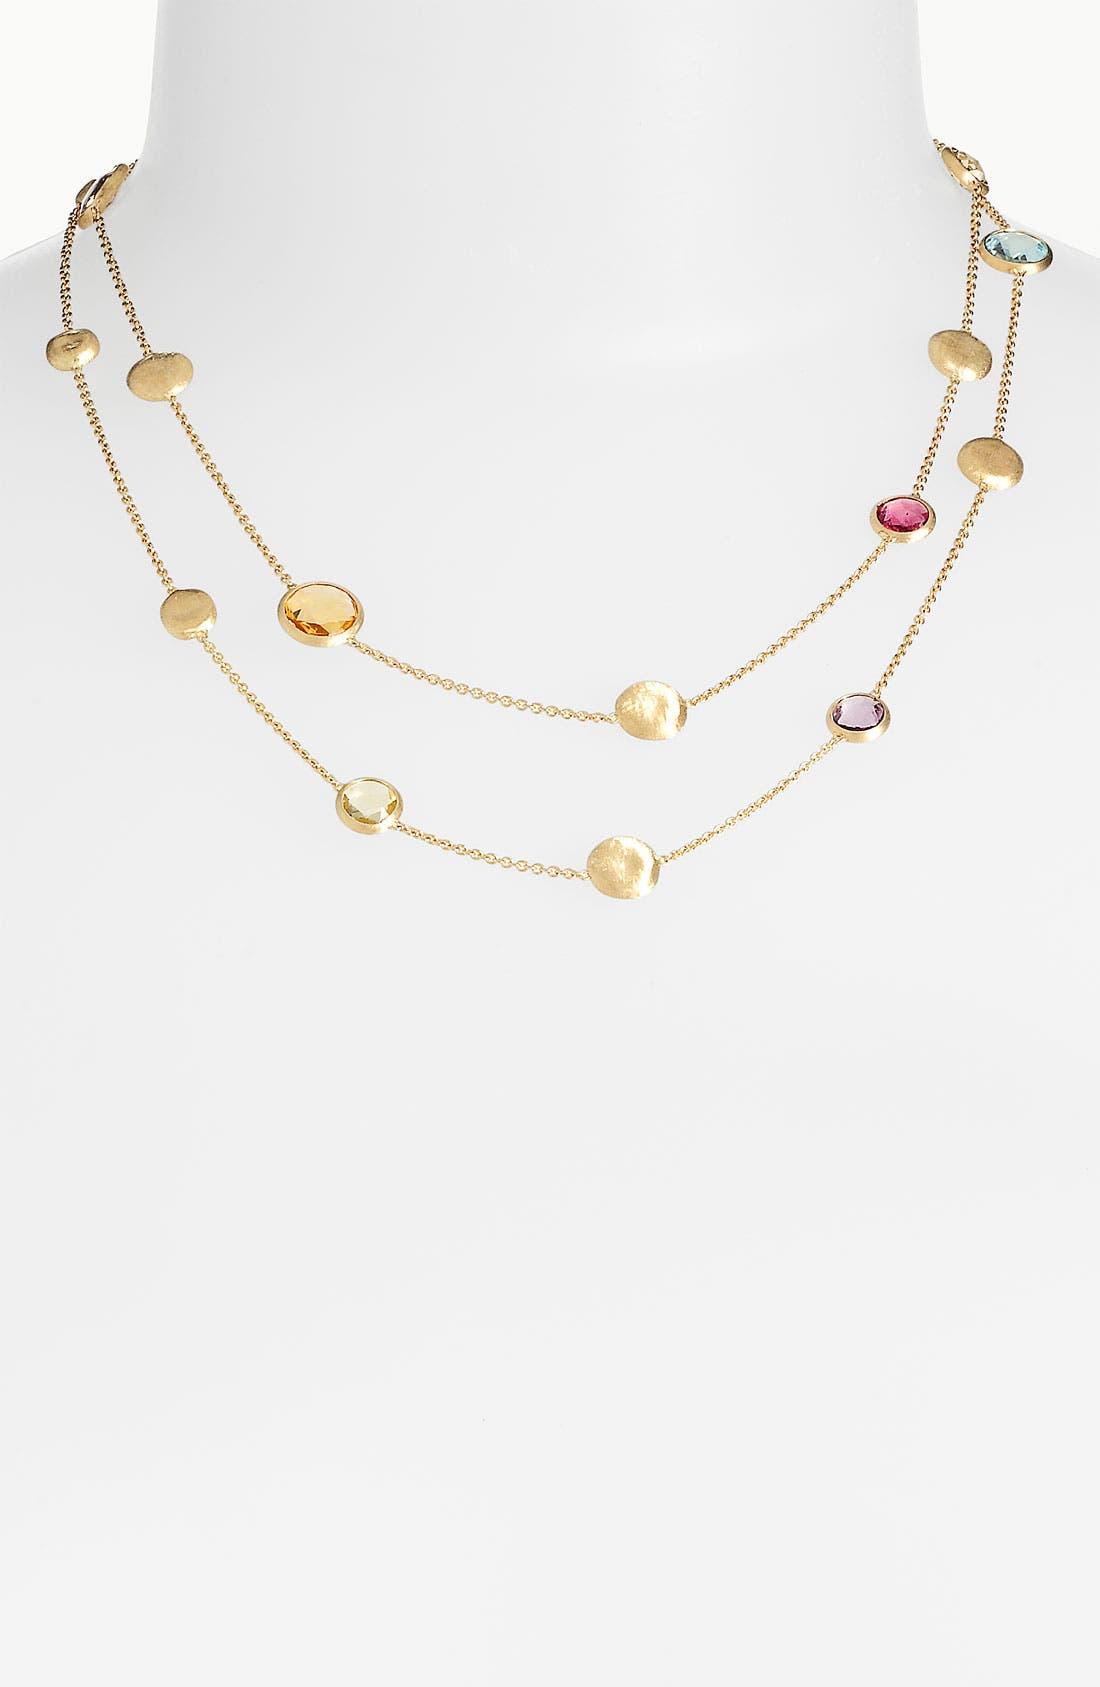 Alternate Image 1 Selected - Marco Bicego 'Jaipur' Semiprecious Stone Long Necklace